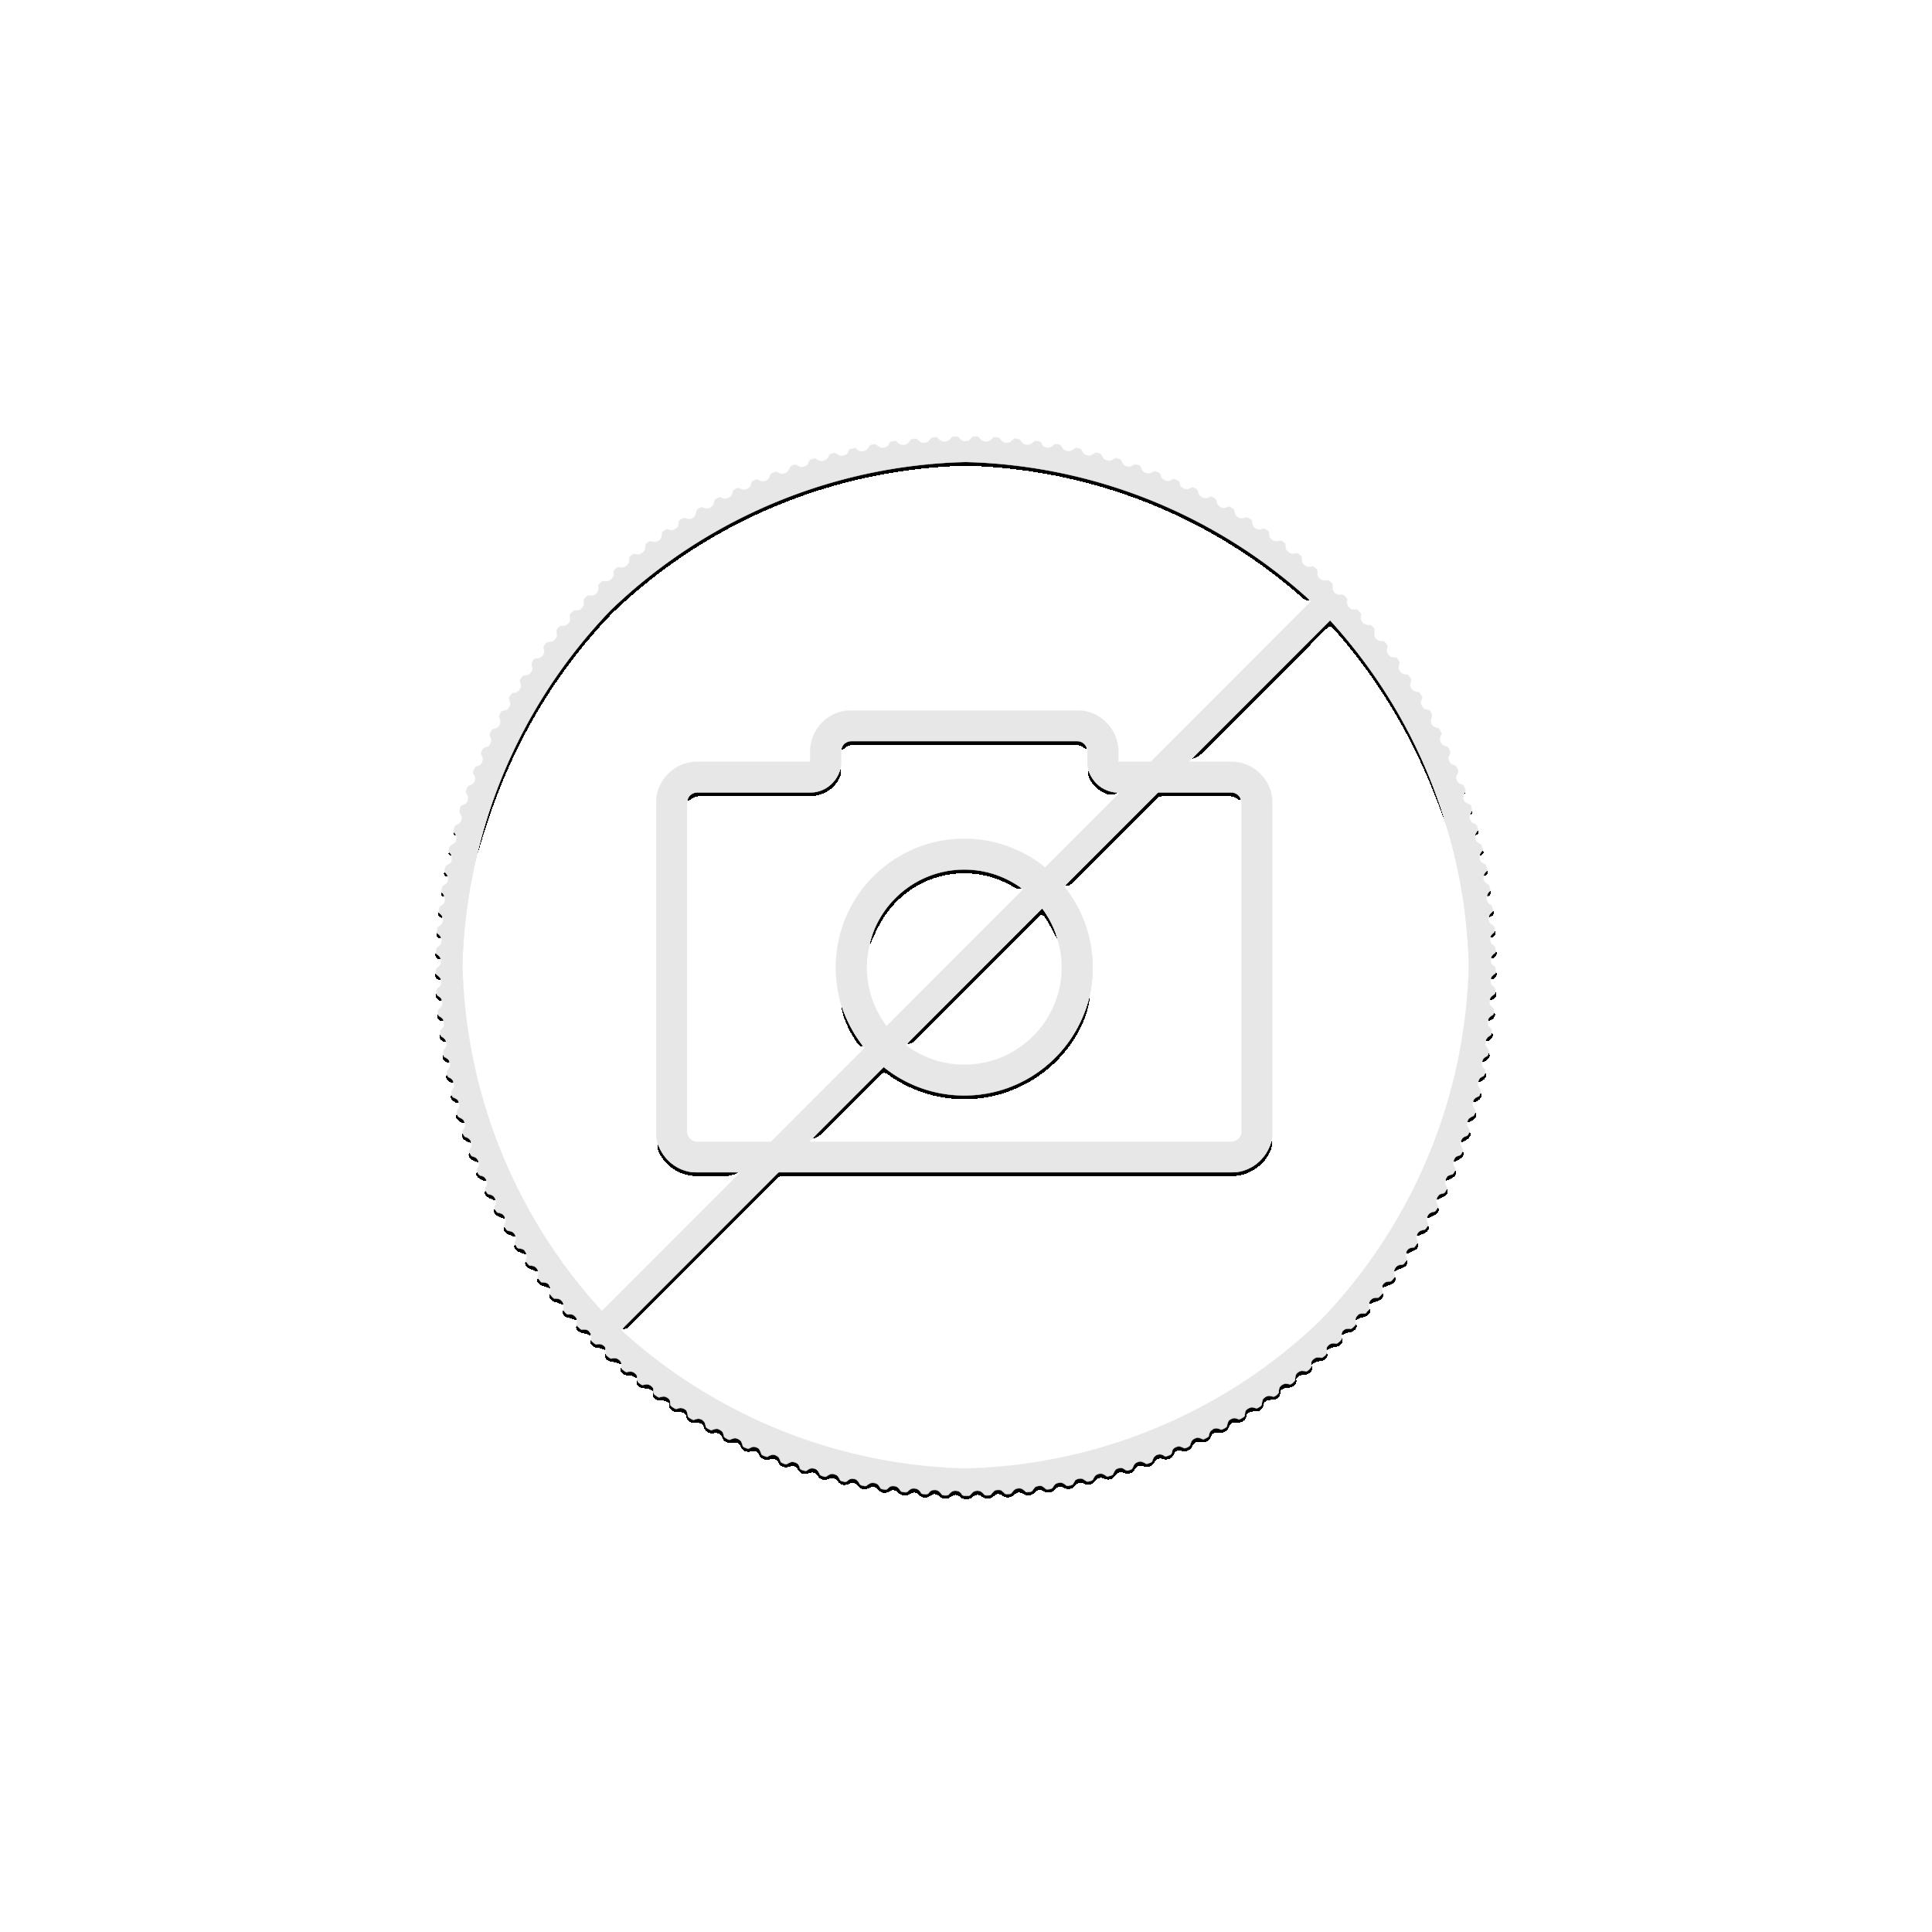 1 troy ounce gouden Lunar munt 2018